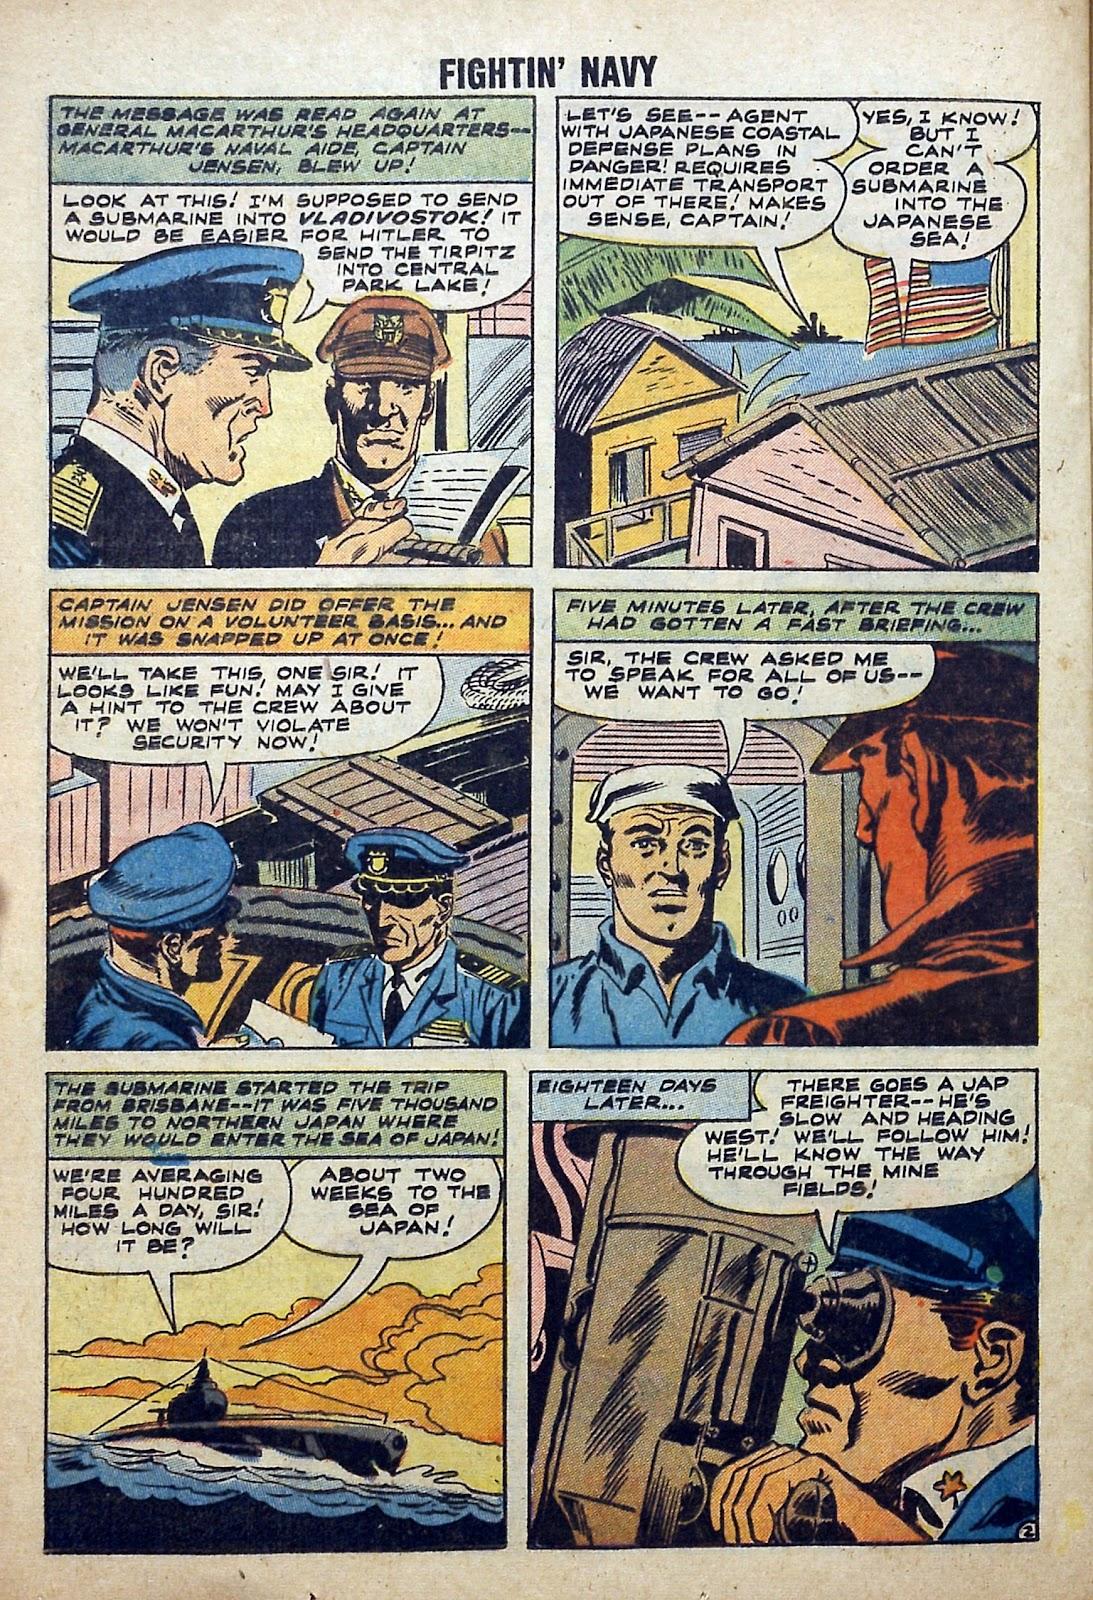 Read online Fightin' Navy comic -  Issue #84 - 24